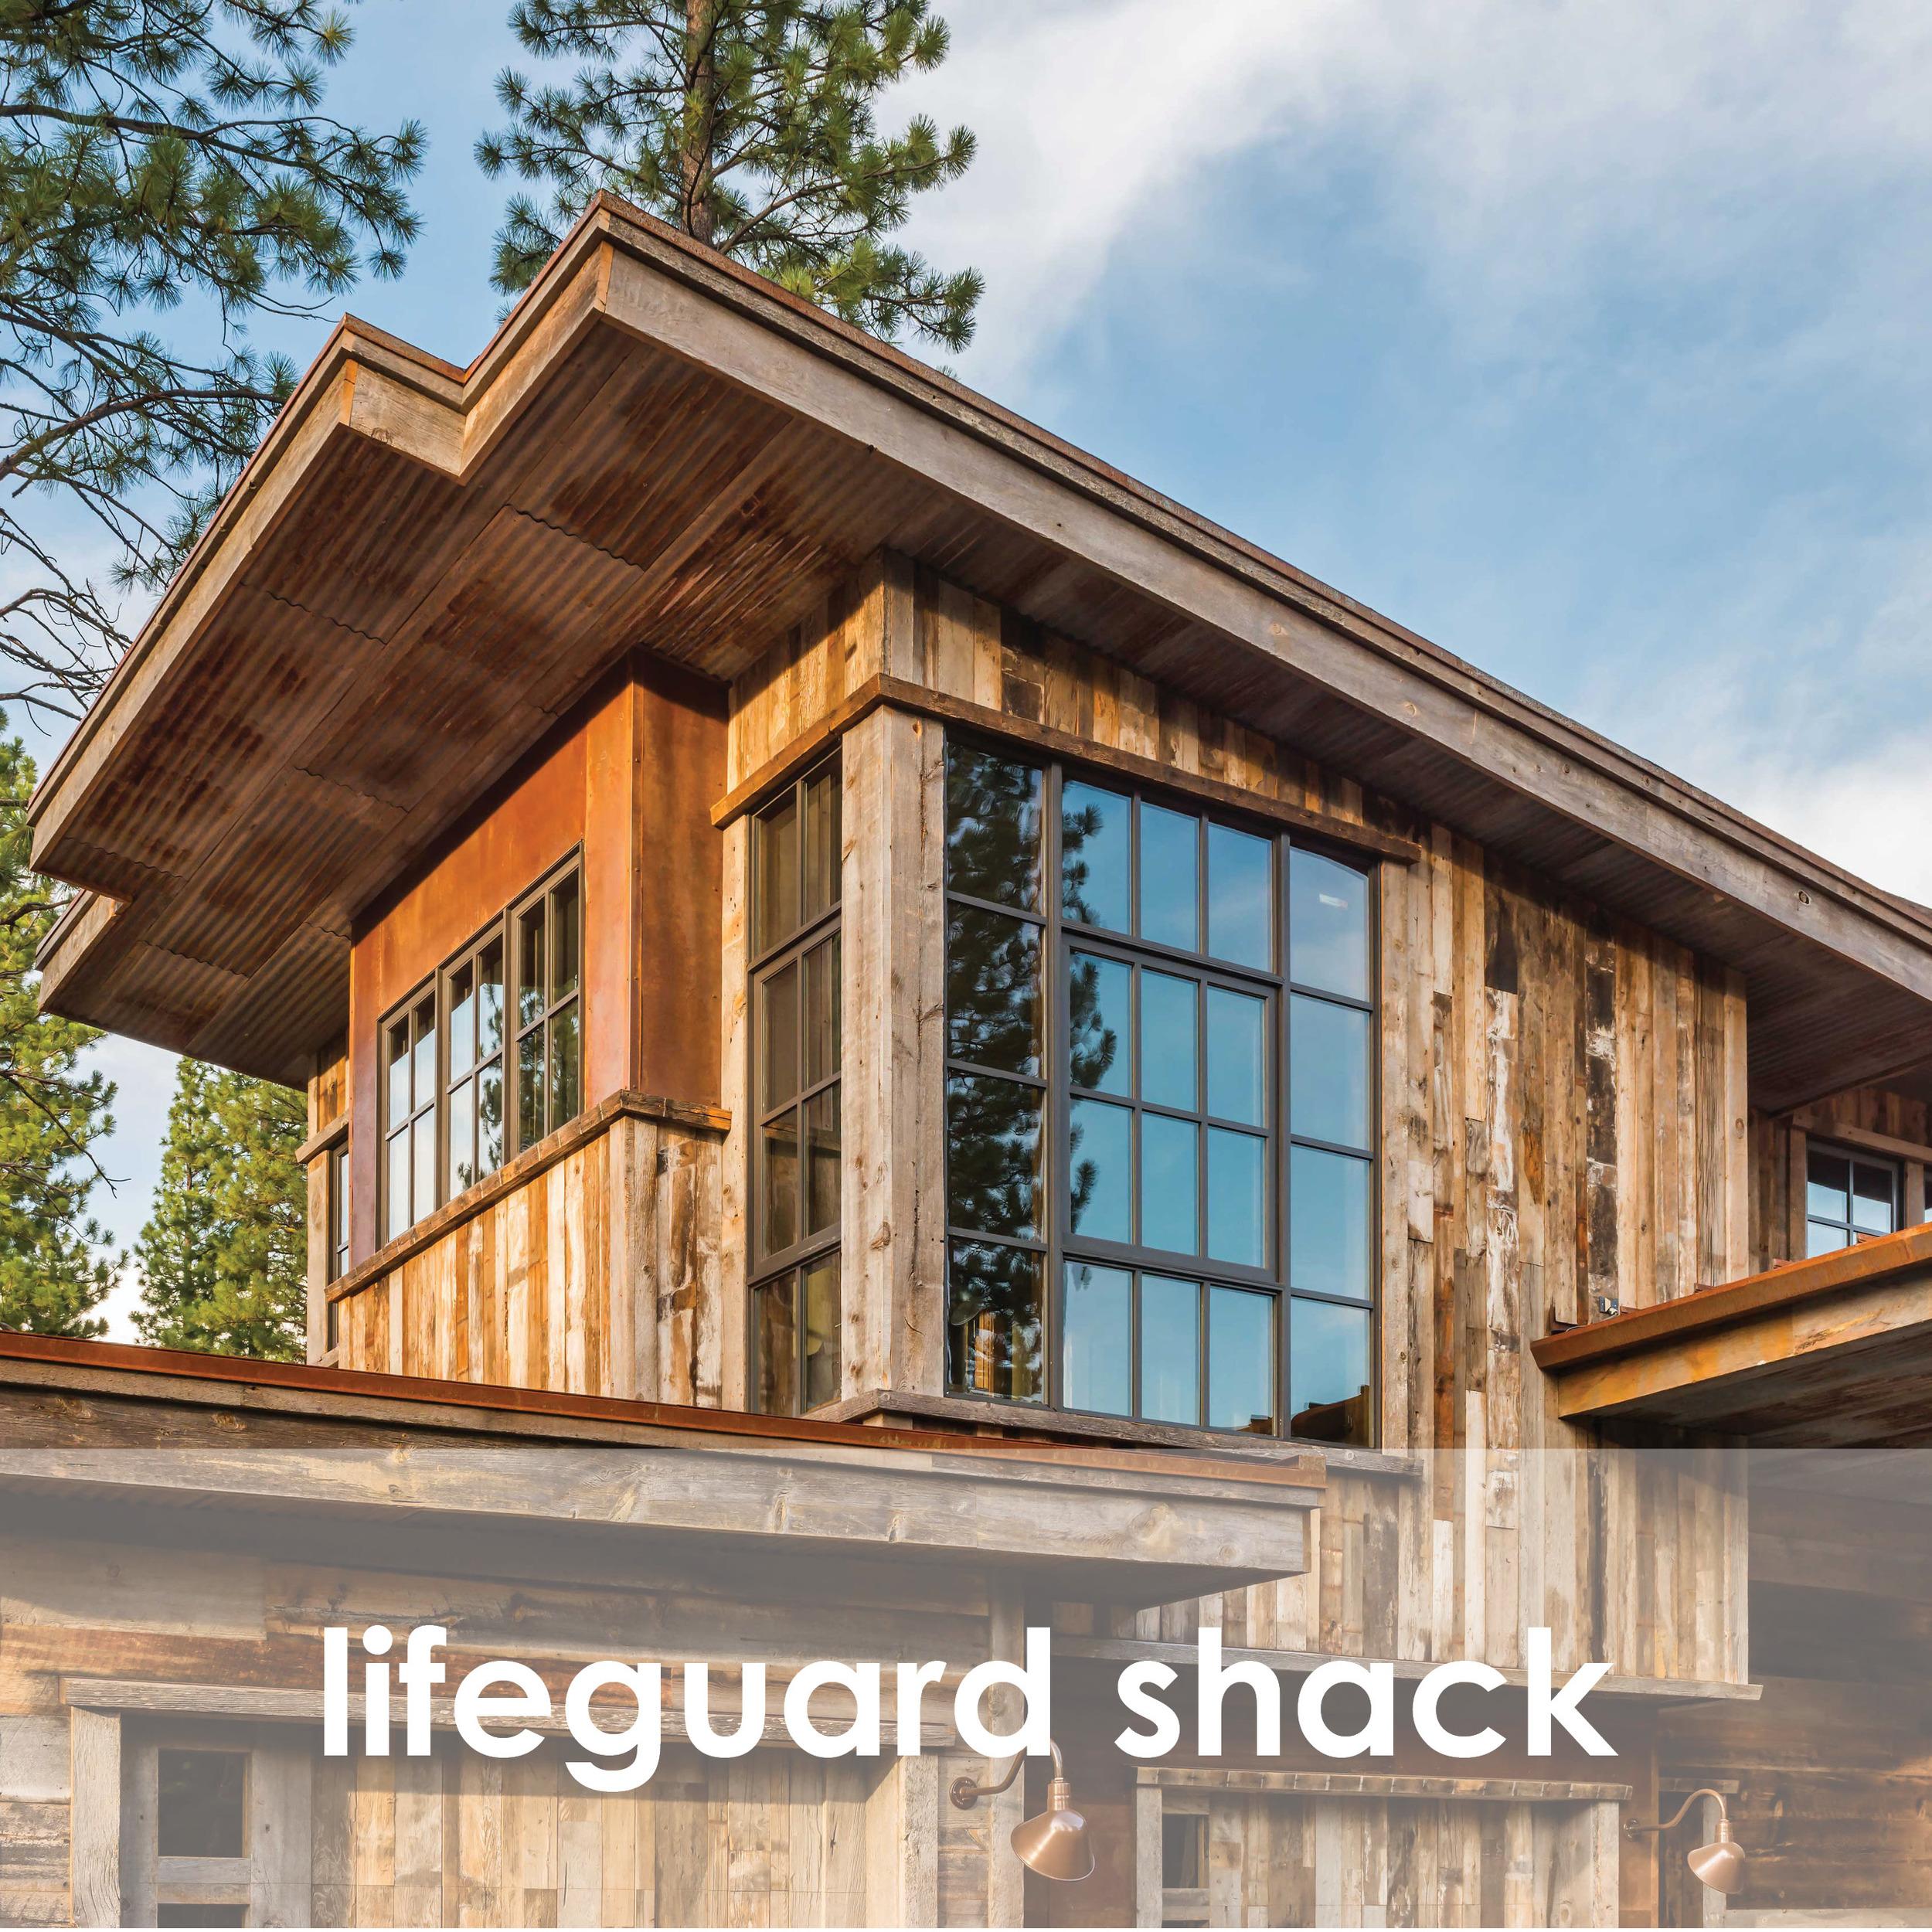 lifeguard shack.jpg